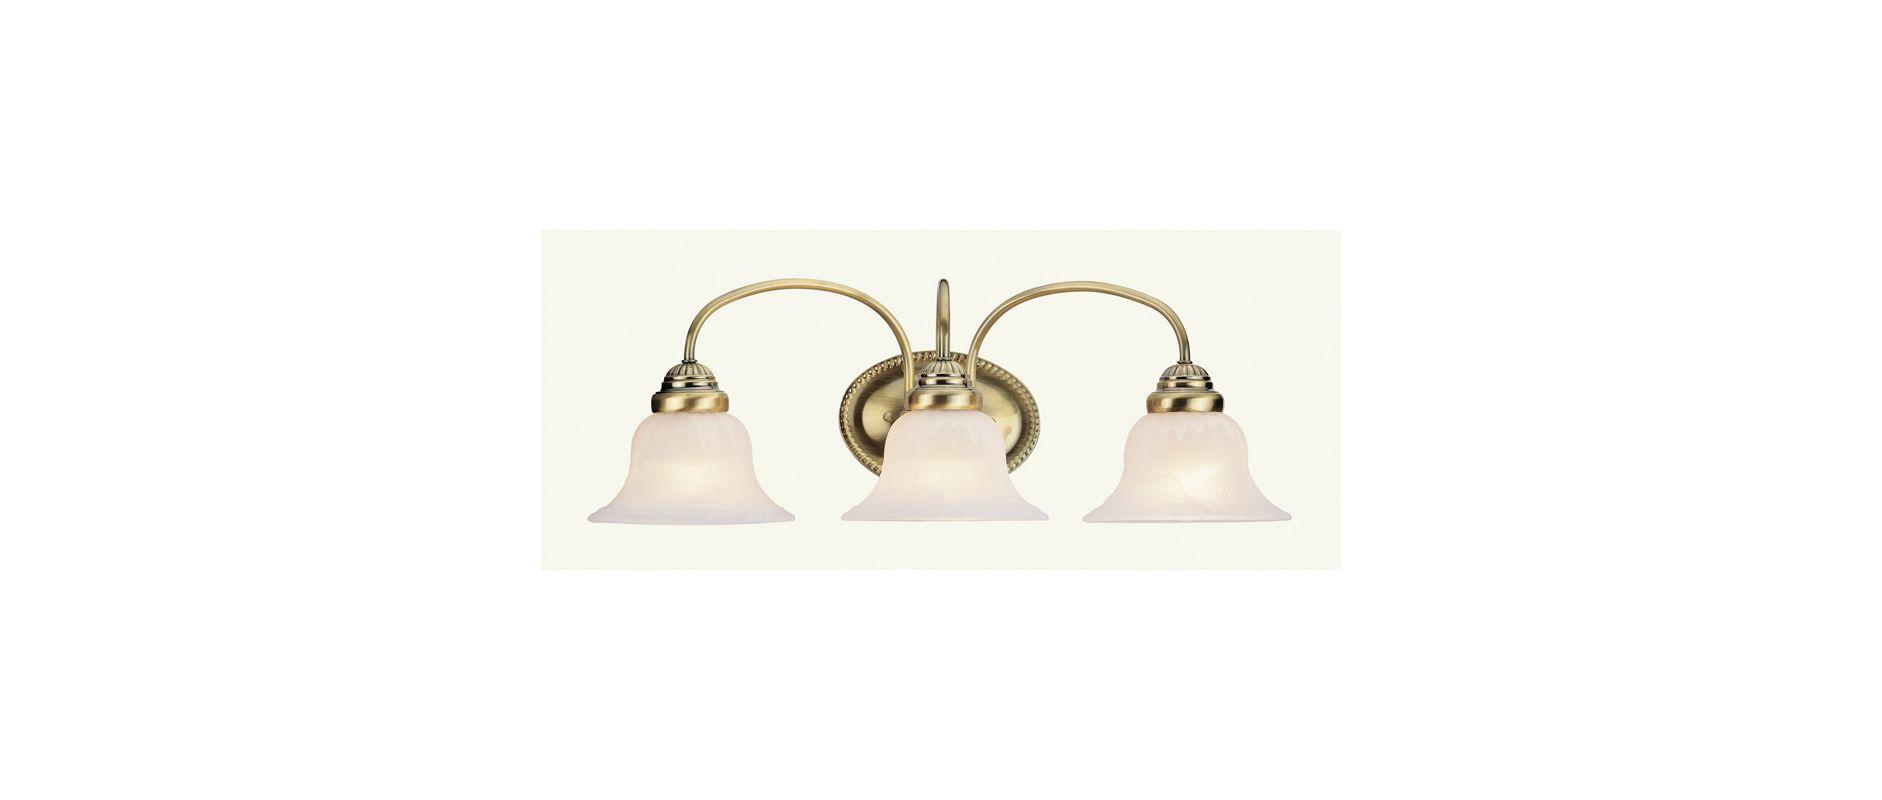 Livex Lighting 1533-01 Antique Brass Edgemont Bathroom